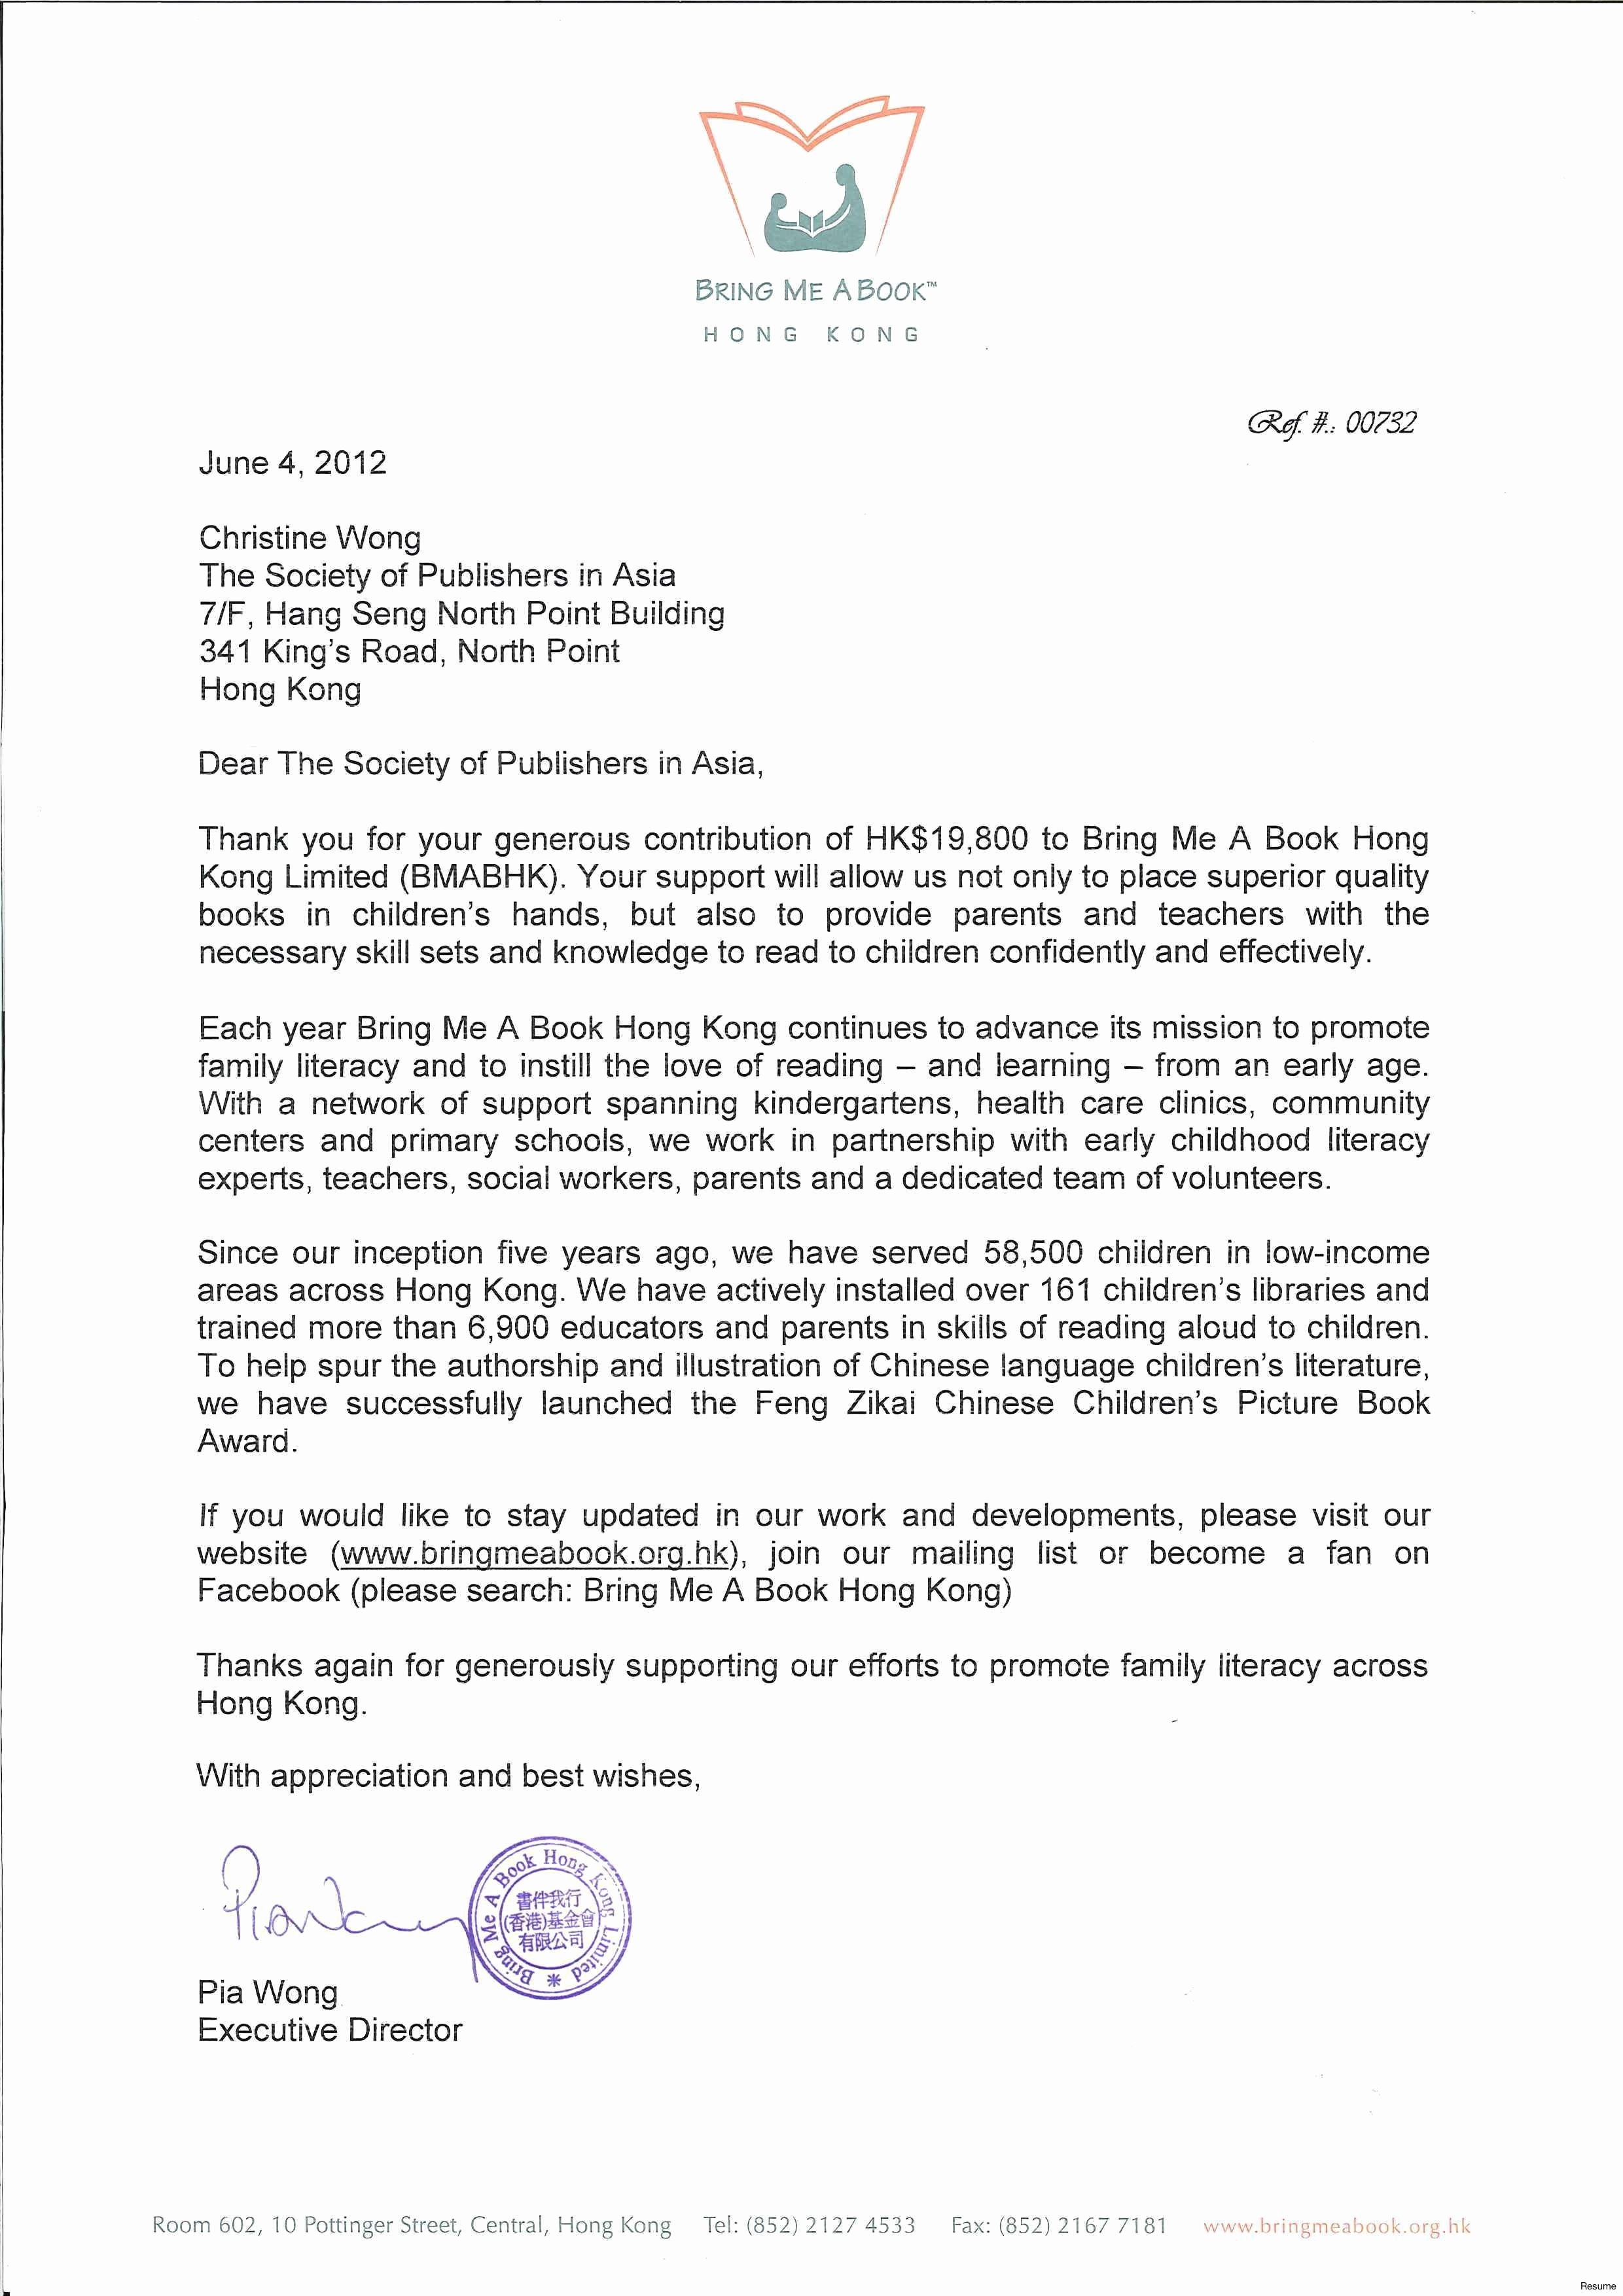 Mission Trip Donation Letter Template Elegant Missionary Support Letter Template Examples